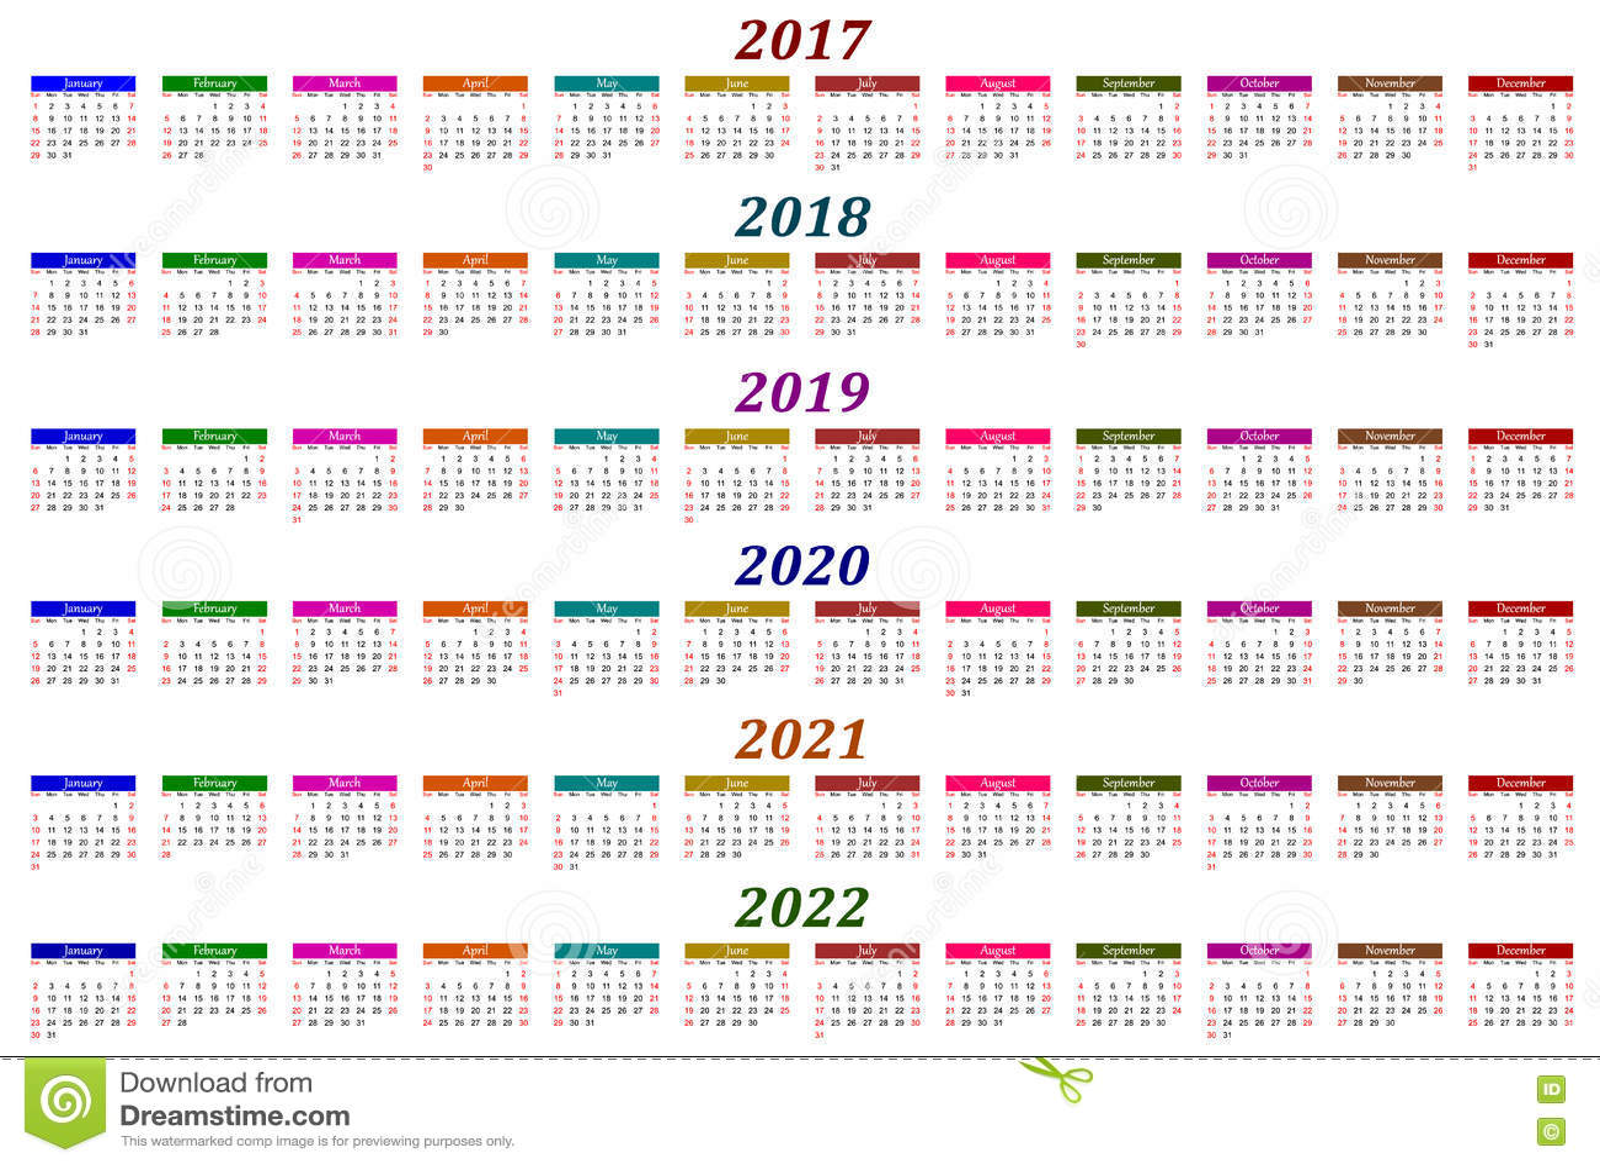 Calendario Editabile 2020.Calendario Di Sei Anni 2017 2018 2019 2020 2021 E 2022